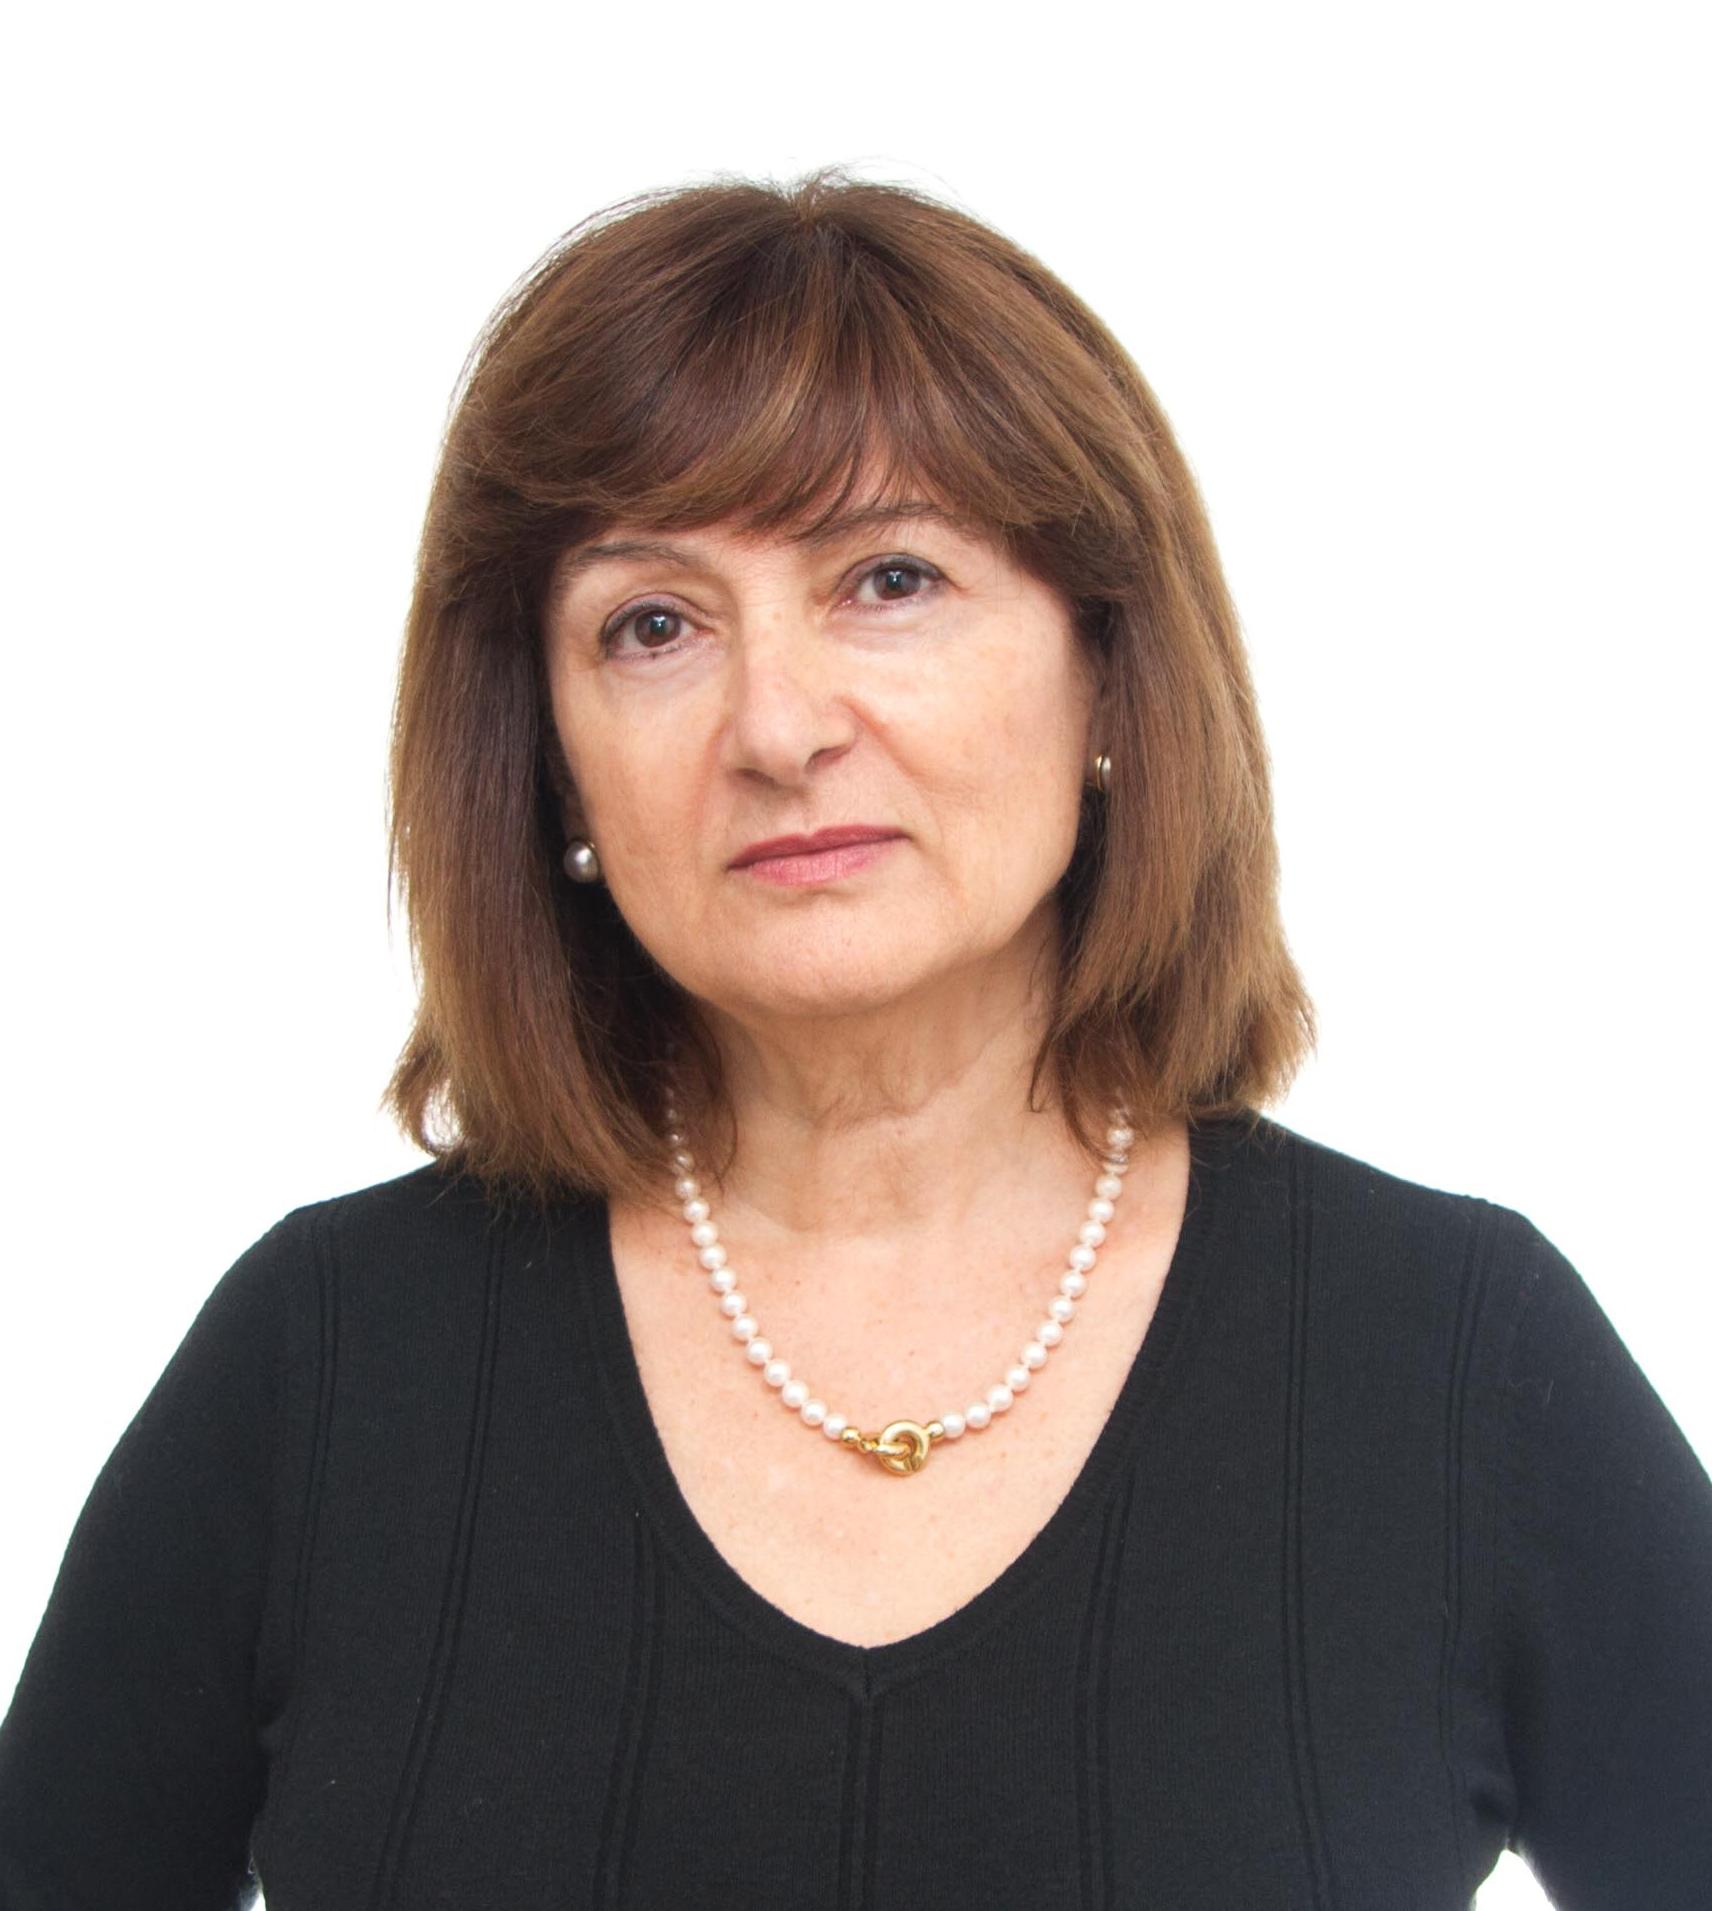 AMELIA CANELO JIMENEZ